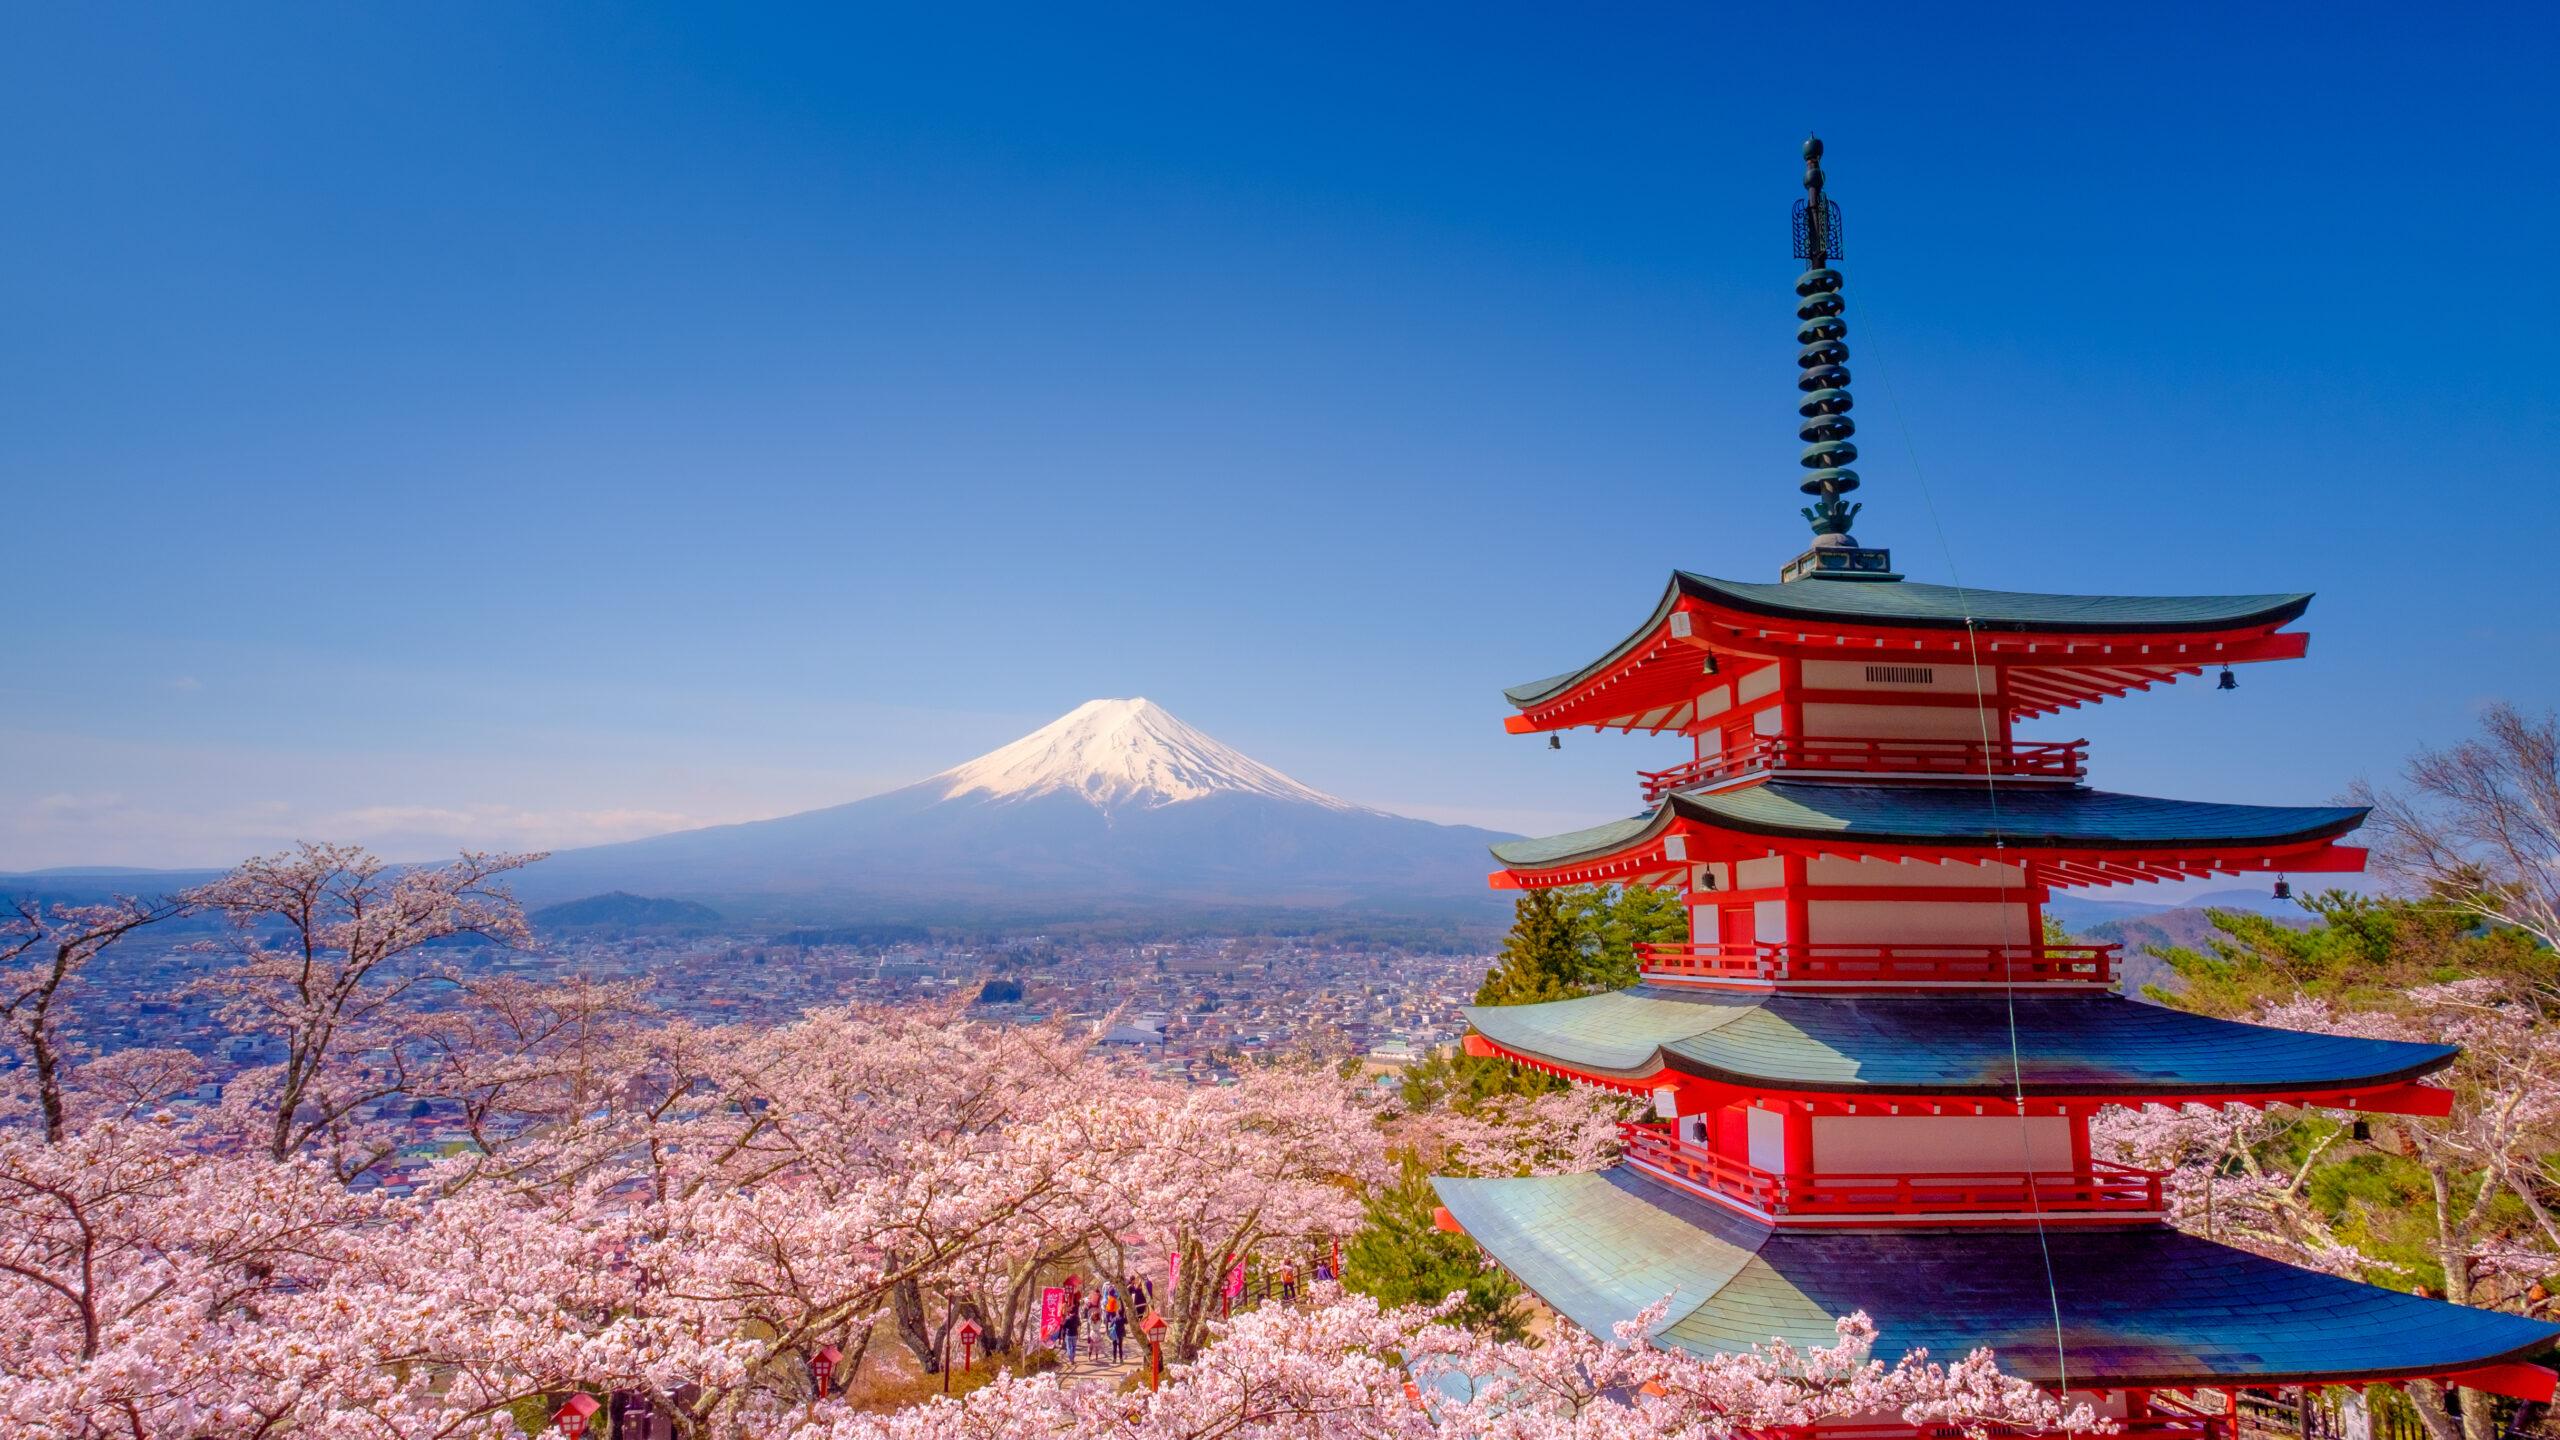 Japan beautiful landscape Mountain Fuji and Chureito red pagoda with cherry blossom Sakura.